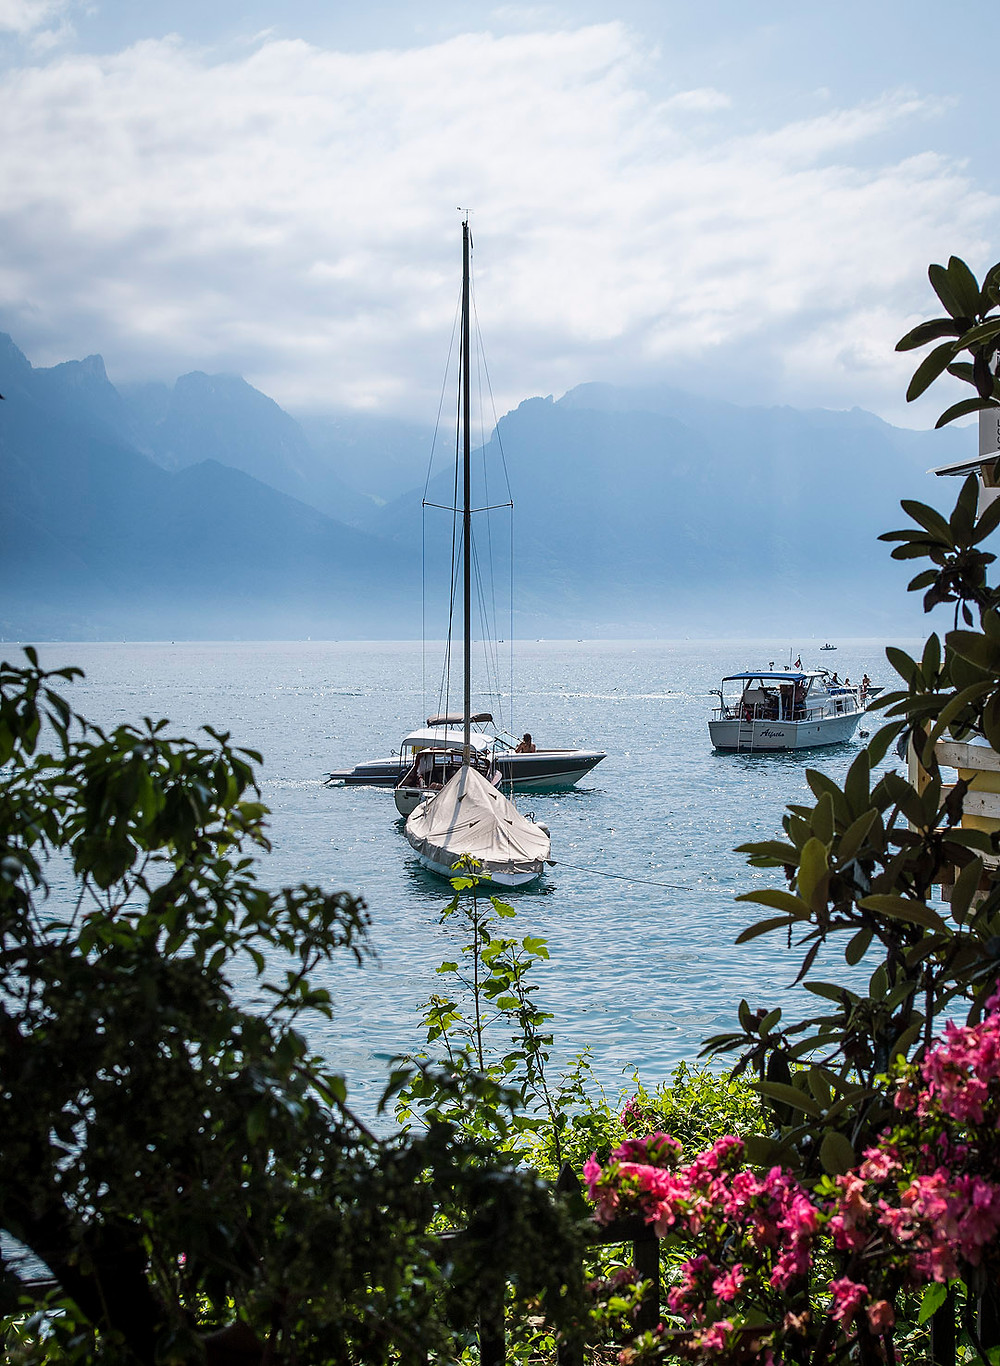 Boat in Montreux, Switzerland